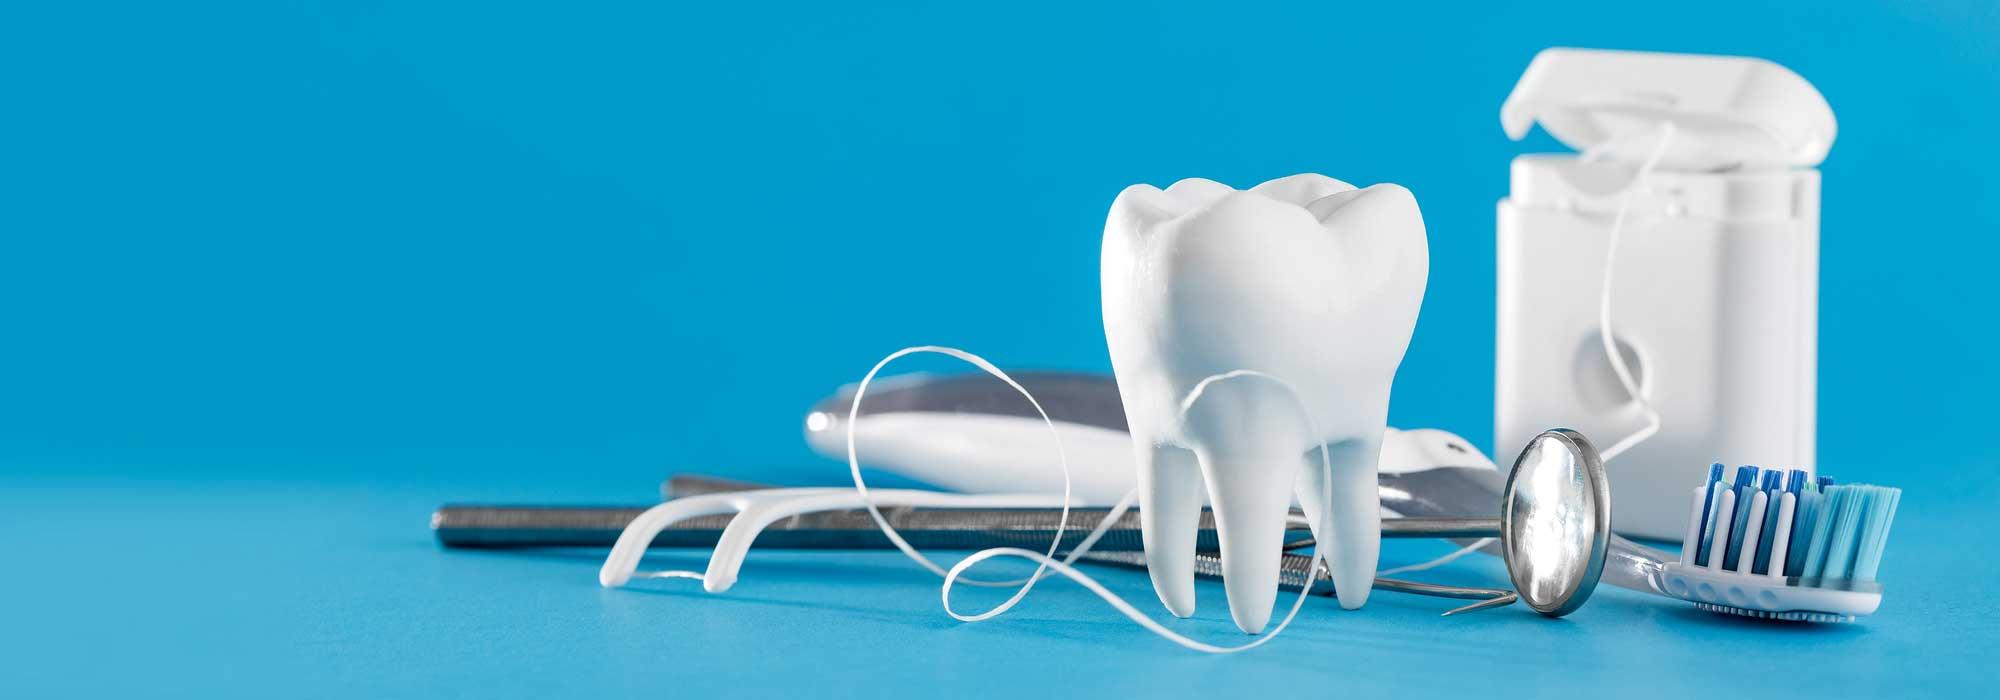 North Shore Pediatric Dental and Orthodontics reviews   Pediatric Dentists at 900 Cummings Center - Beverly MA